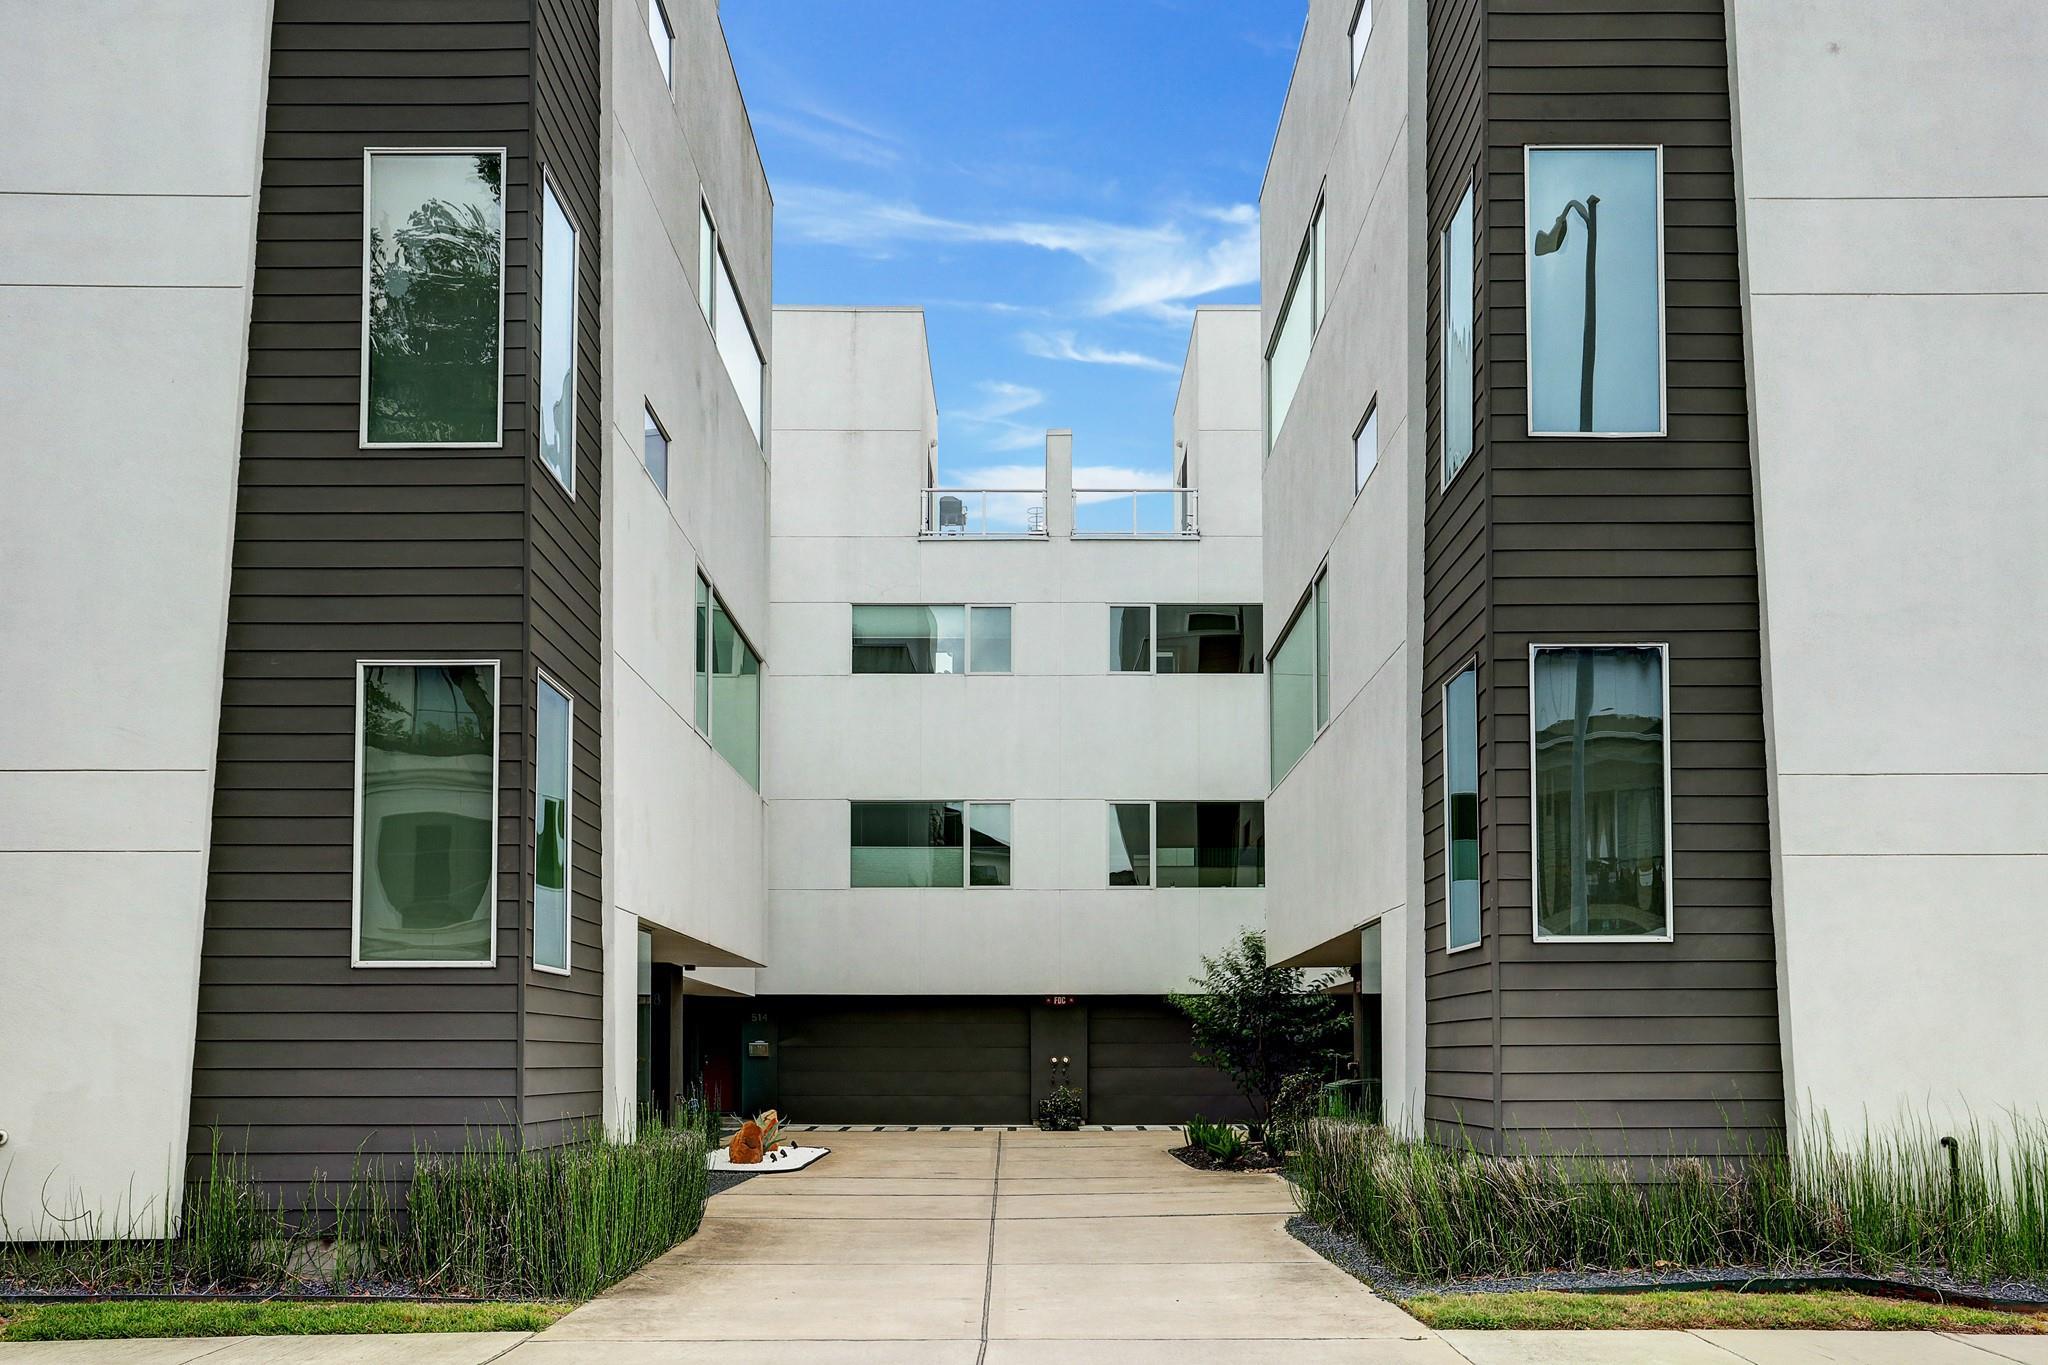 Alden Place Pt Rep 1 Amd Real Estate Listings Main Image